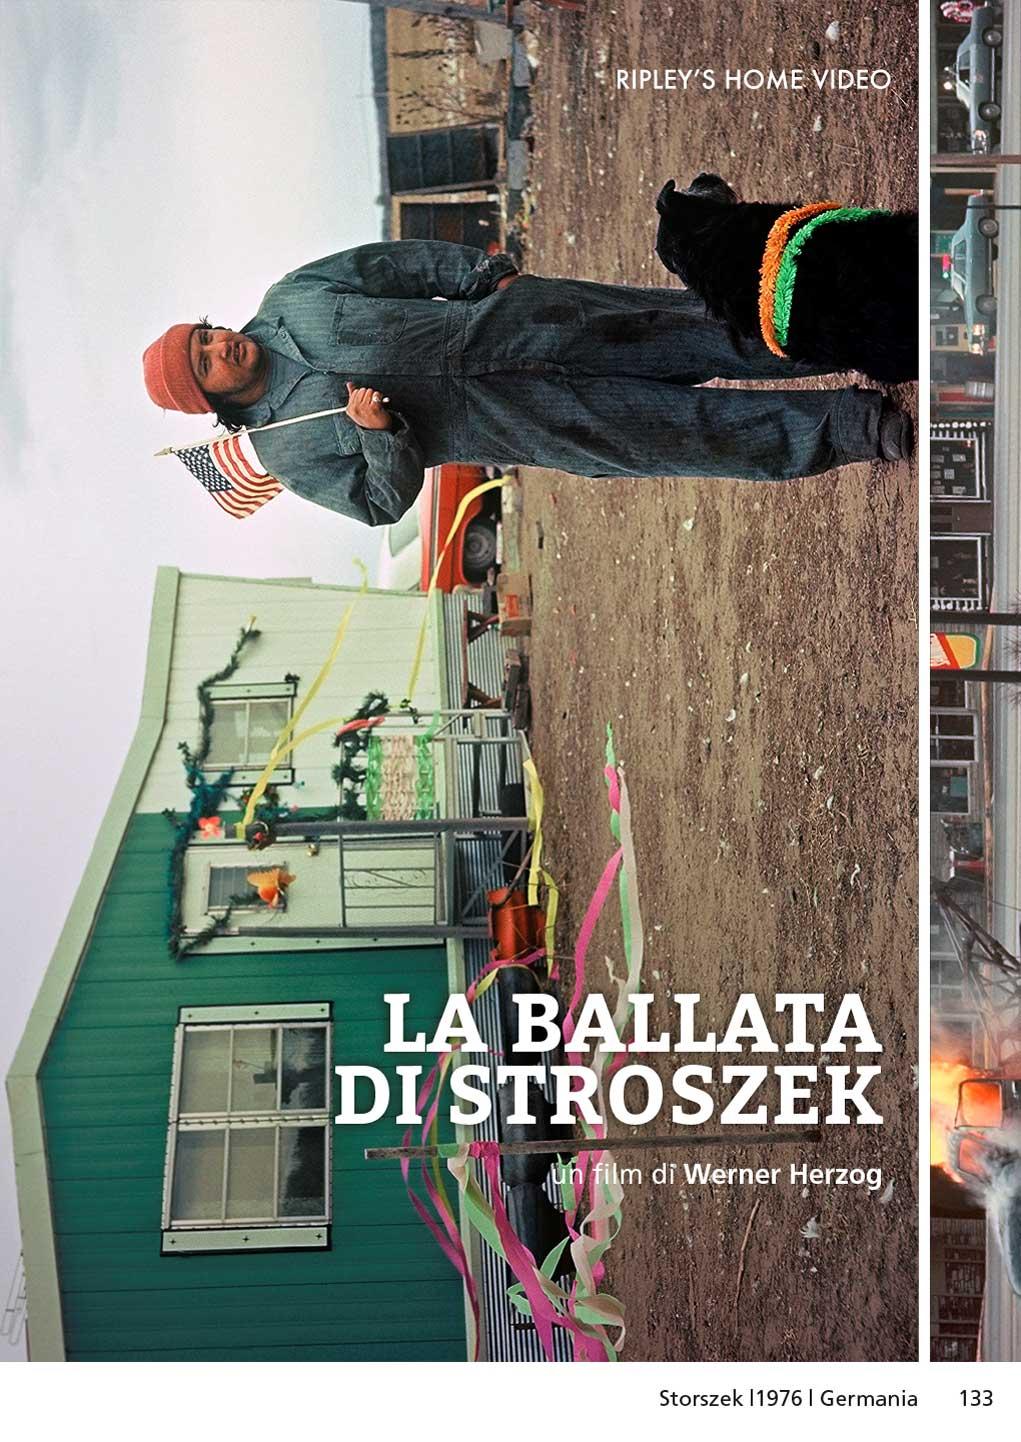 LA BALLATA DI STROSZEK (2 DVD) (DVD)